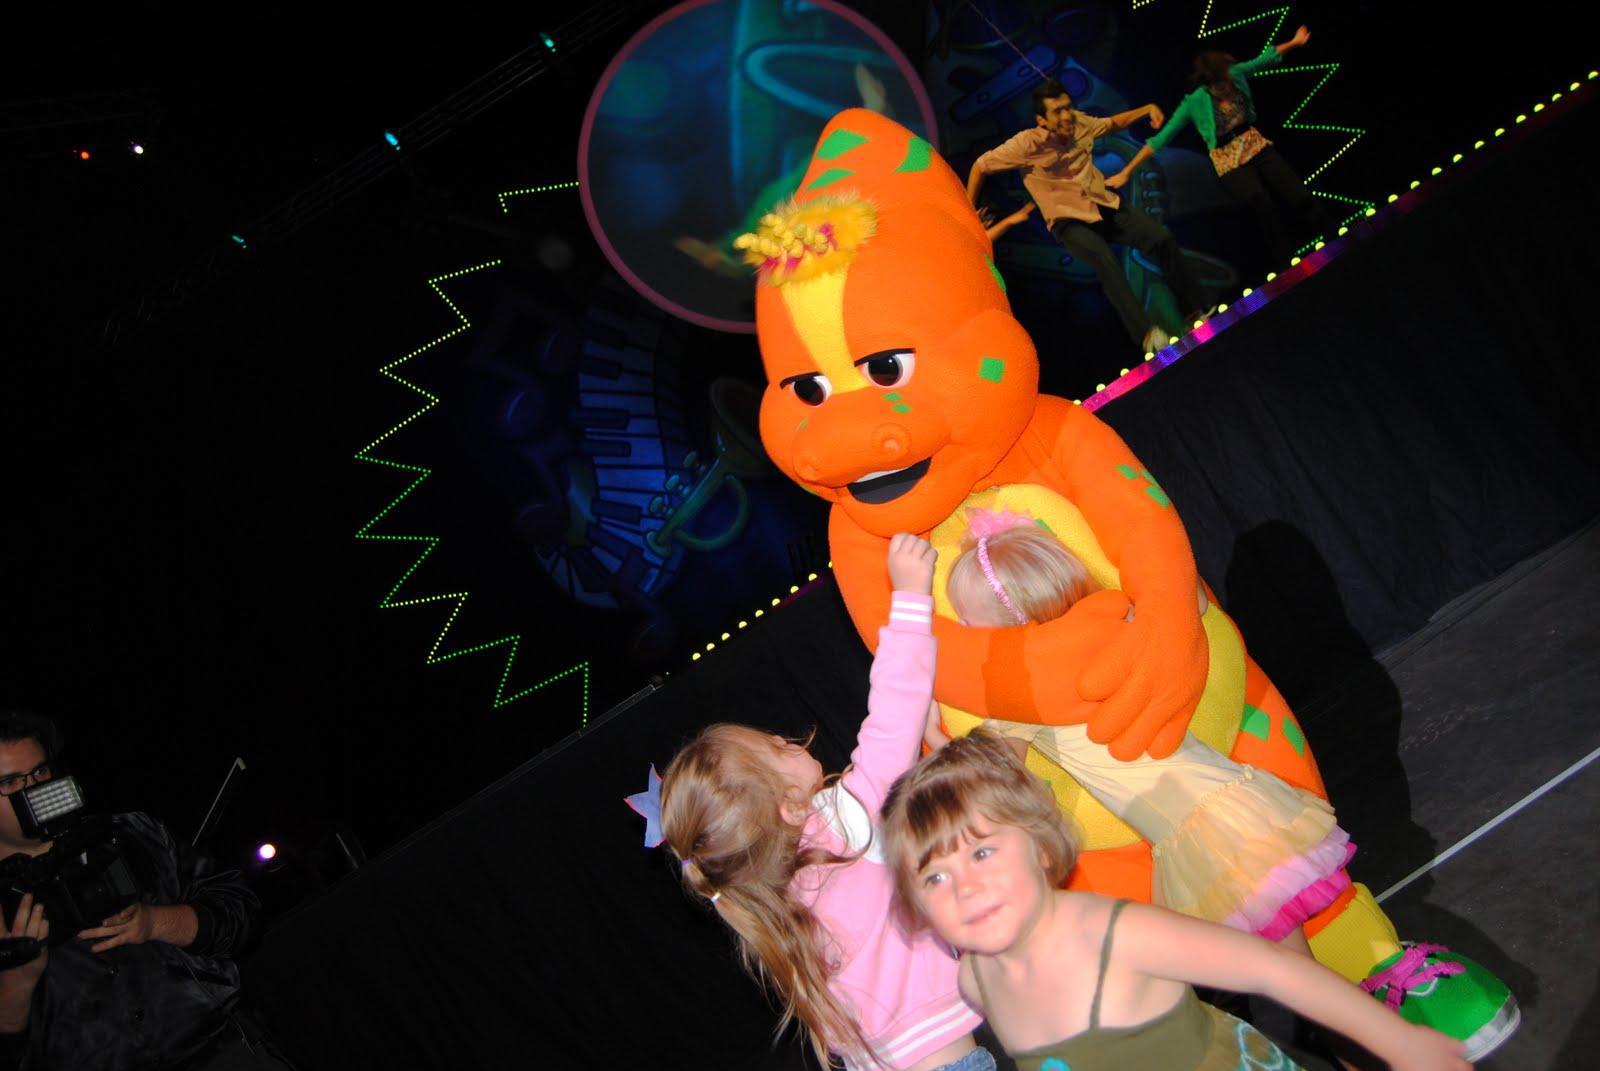 Hoisington Party Of Barney Live - Barney live in concert birthday